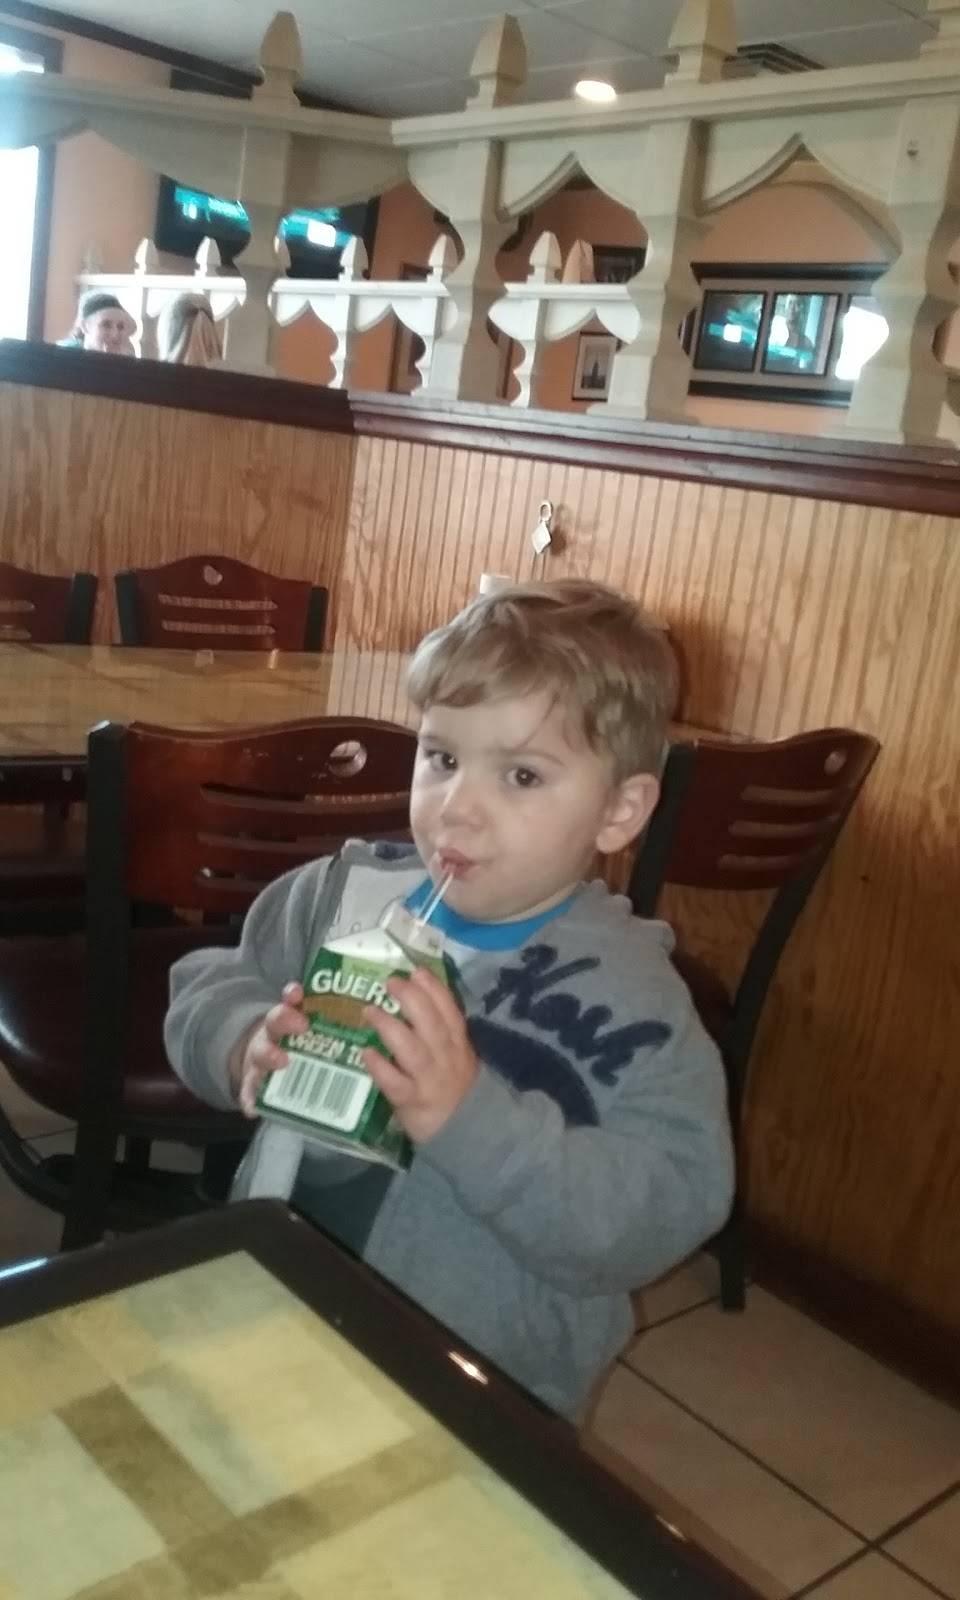 Anthonys Pizza & Subs | restaurant | 416 S Lehigh Ave, Frackville, PA 17931, USA | 5708741722 OR +1 570-874-1722